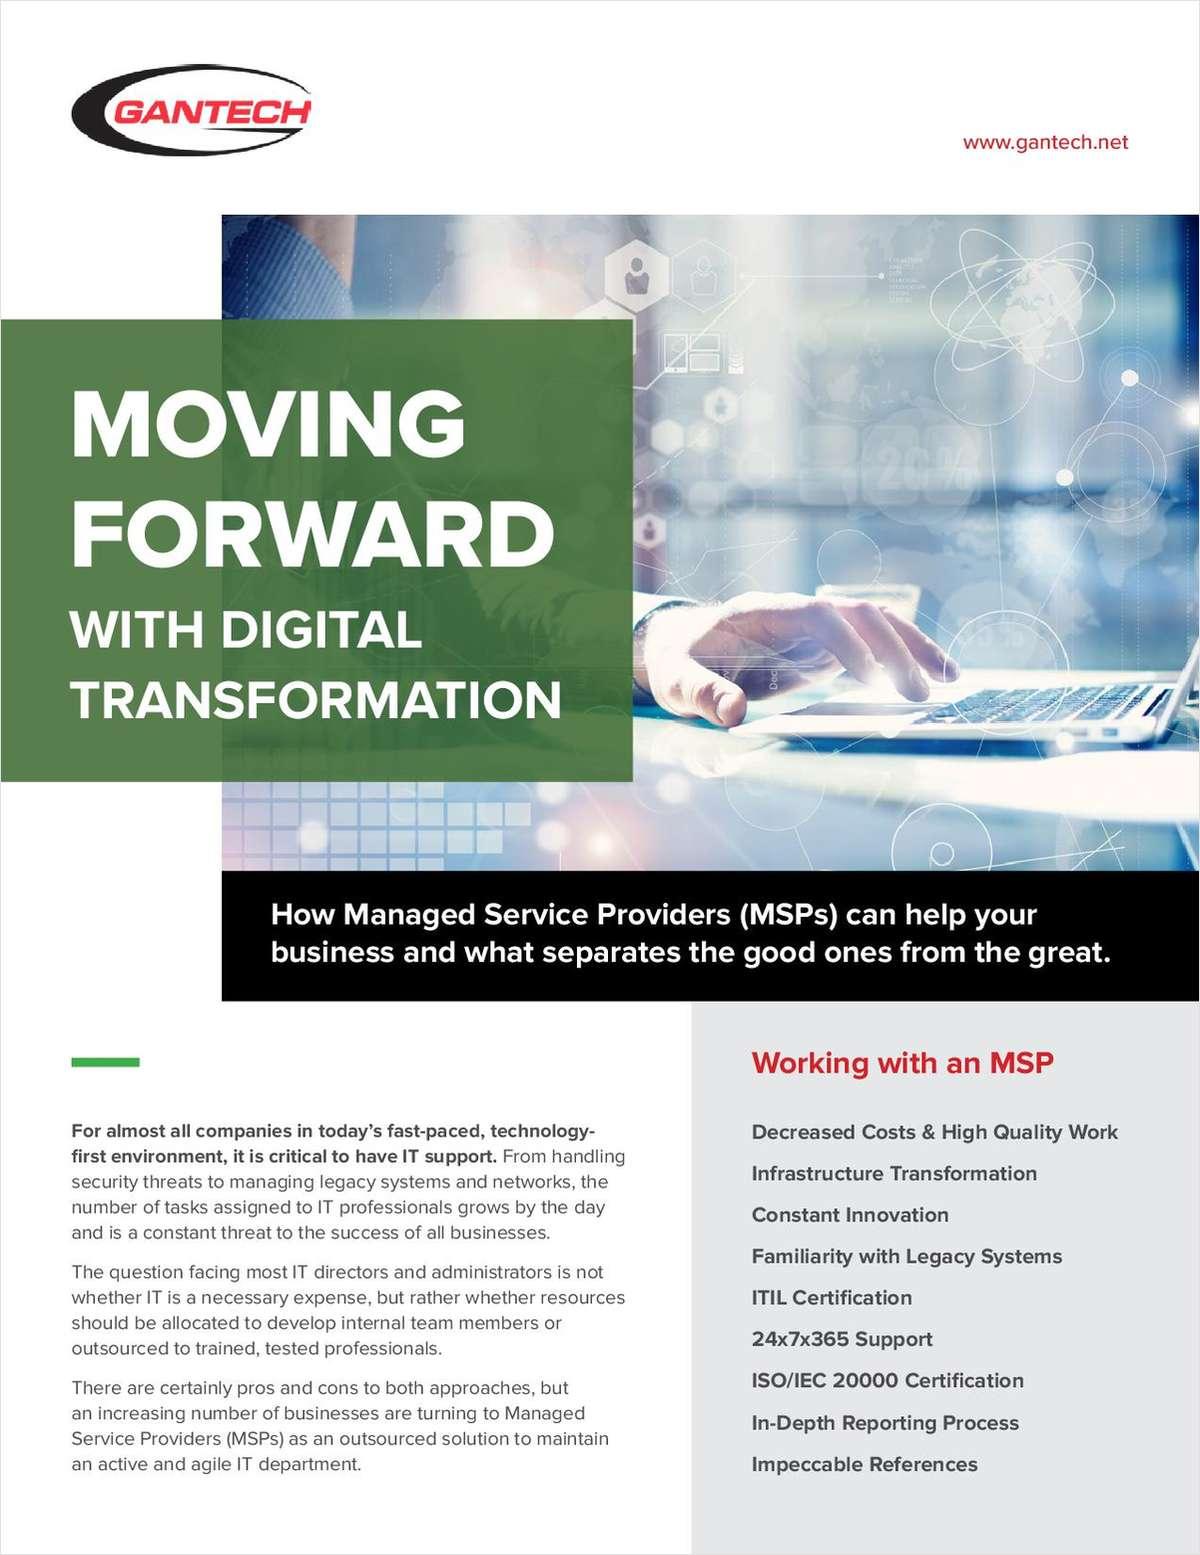 Moving Forward with Digital Transformation